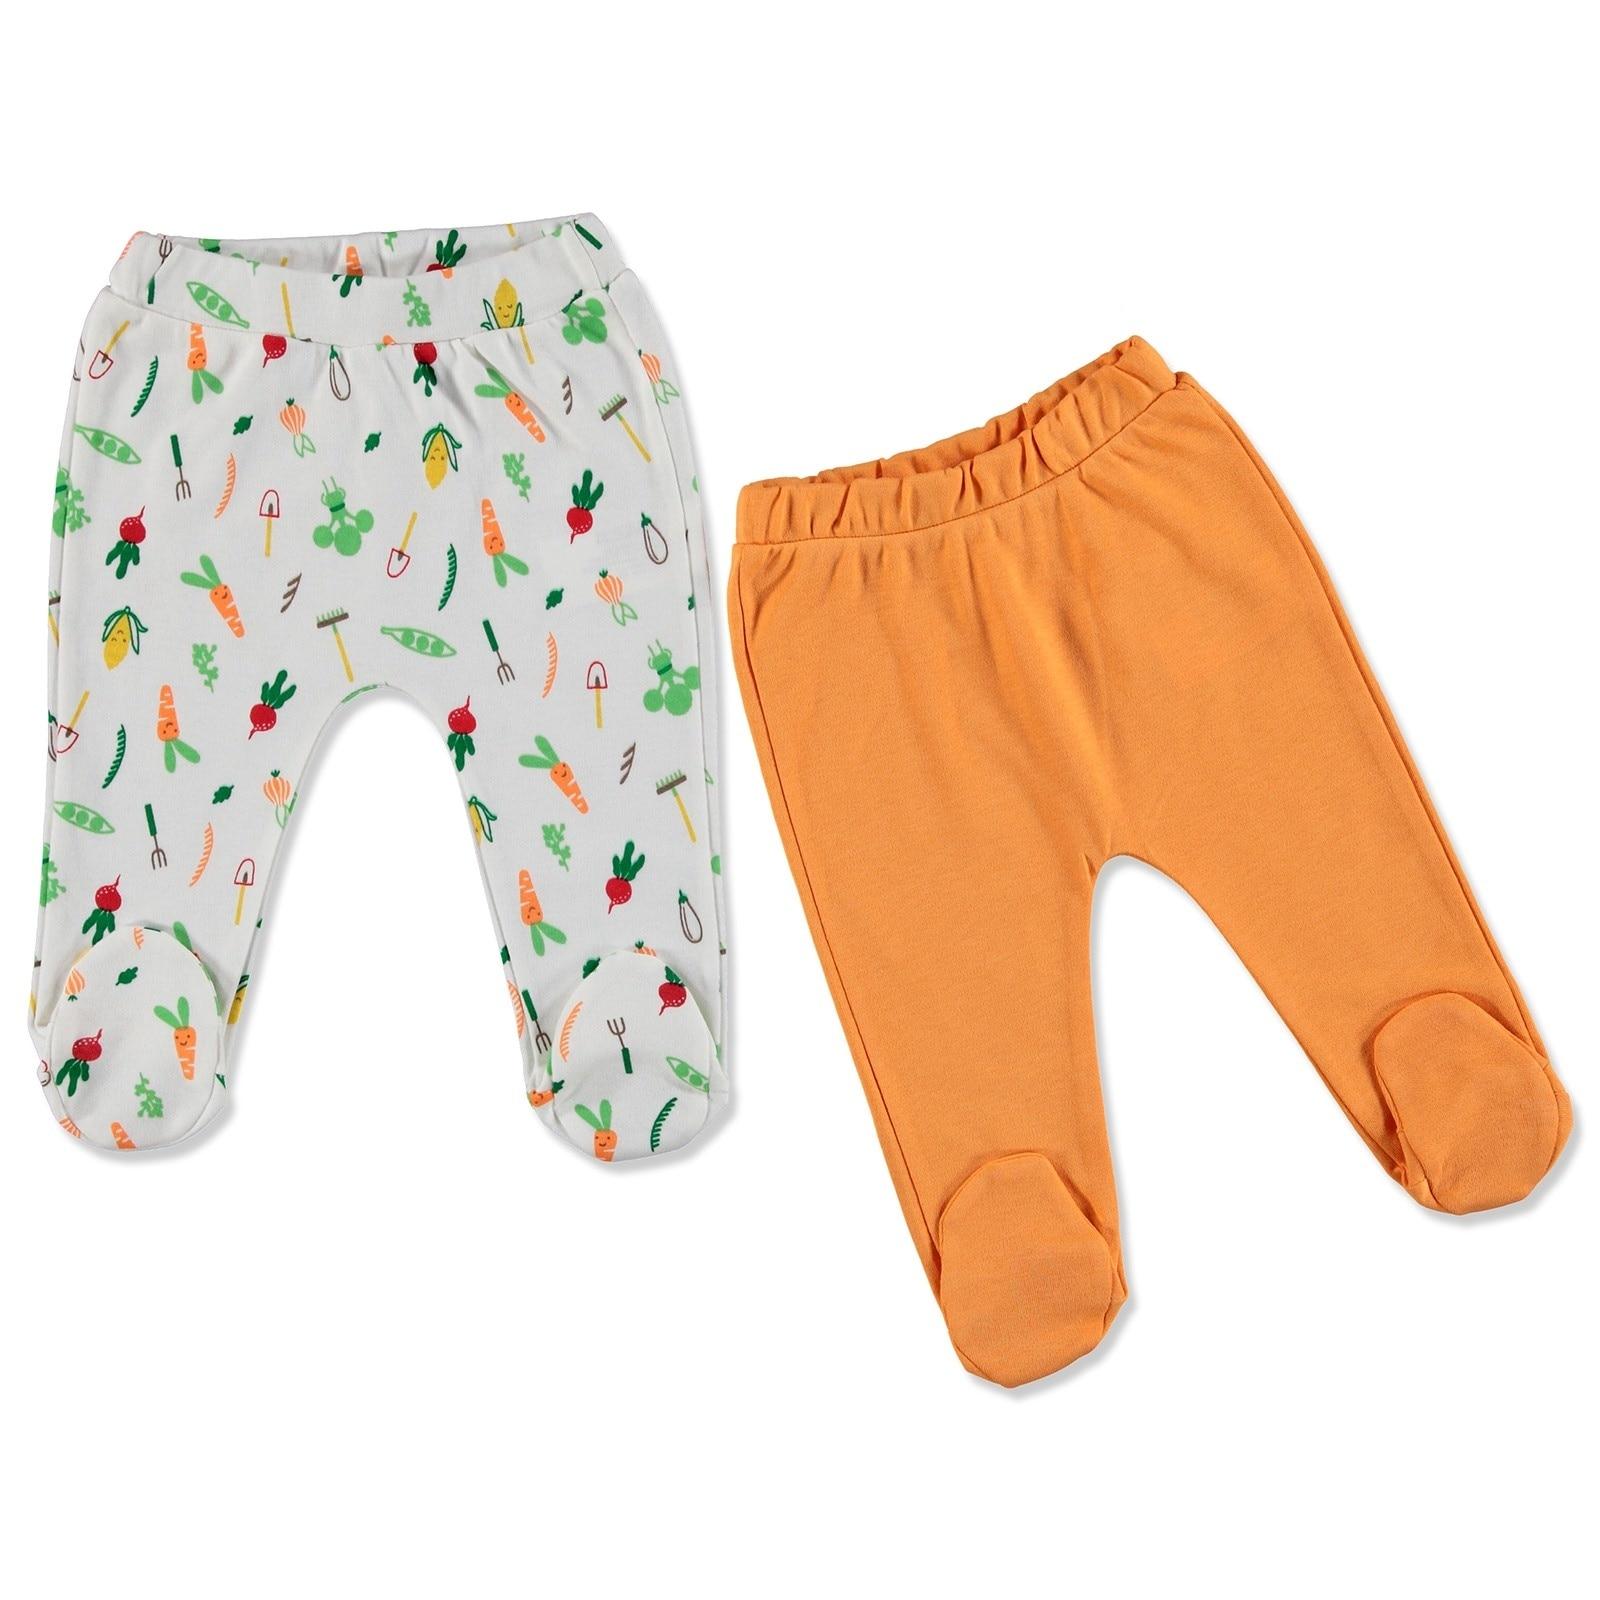 Ebebek HelloBaby Summer Baby Sweet Vegetables Footed Pant 2 Pcs